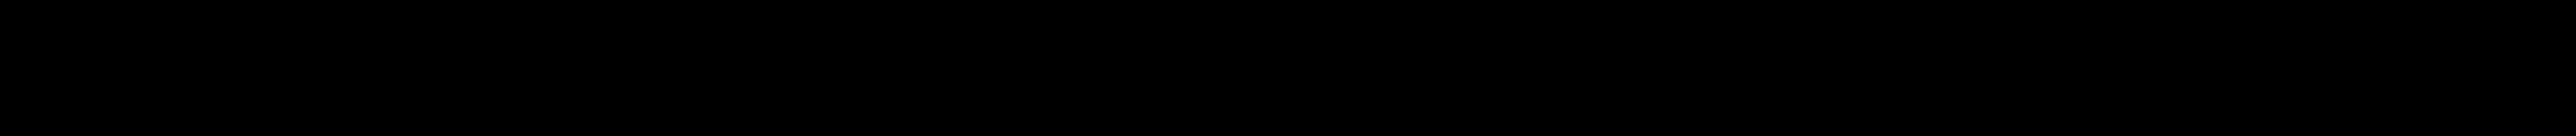 KERNELSTUFF ORG